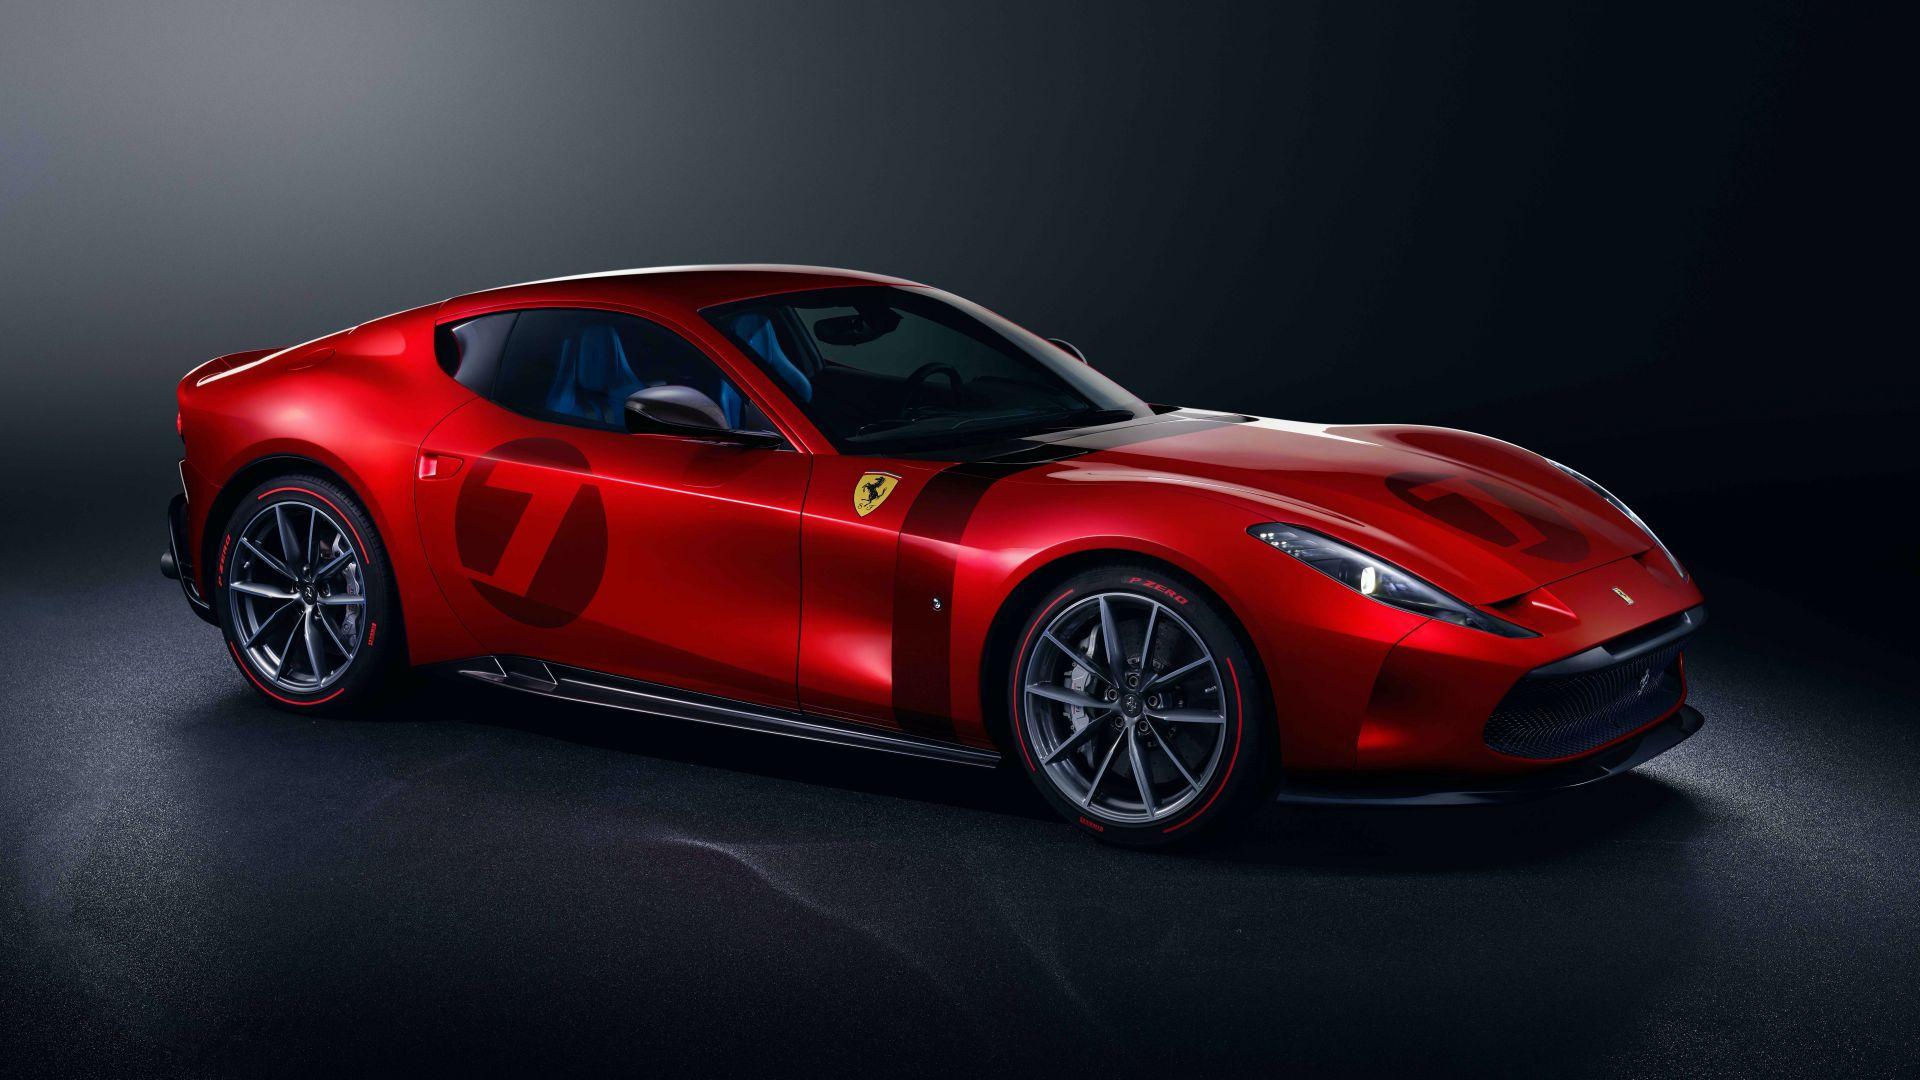 Ferrari Omologata one-off